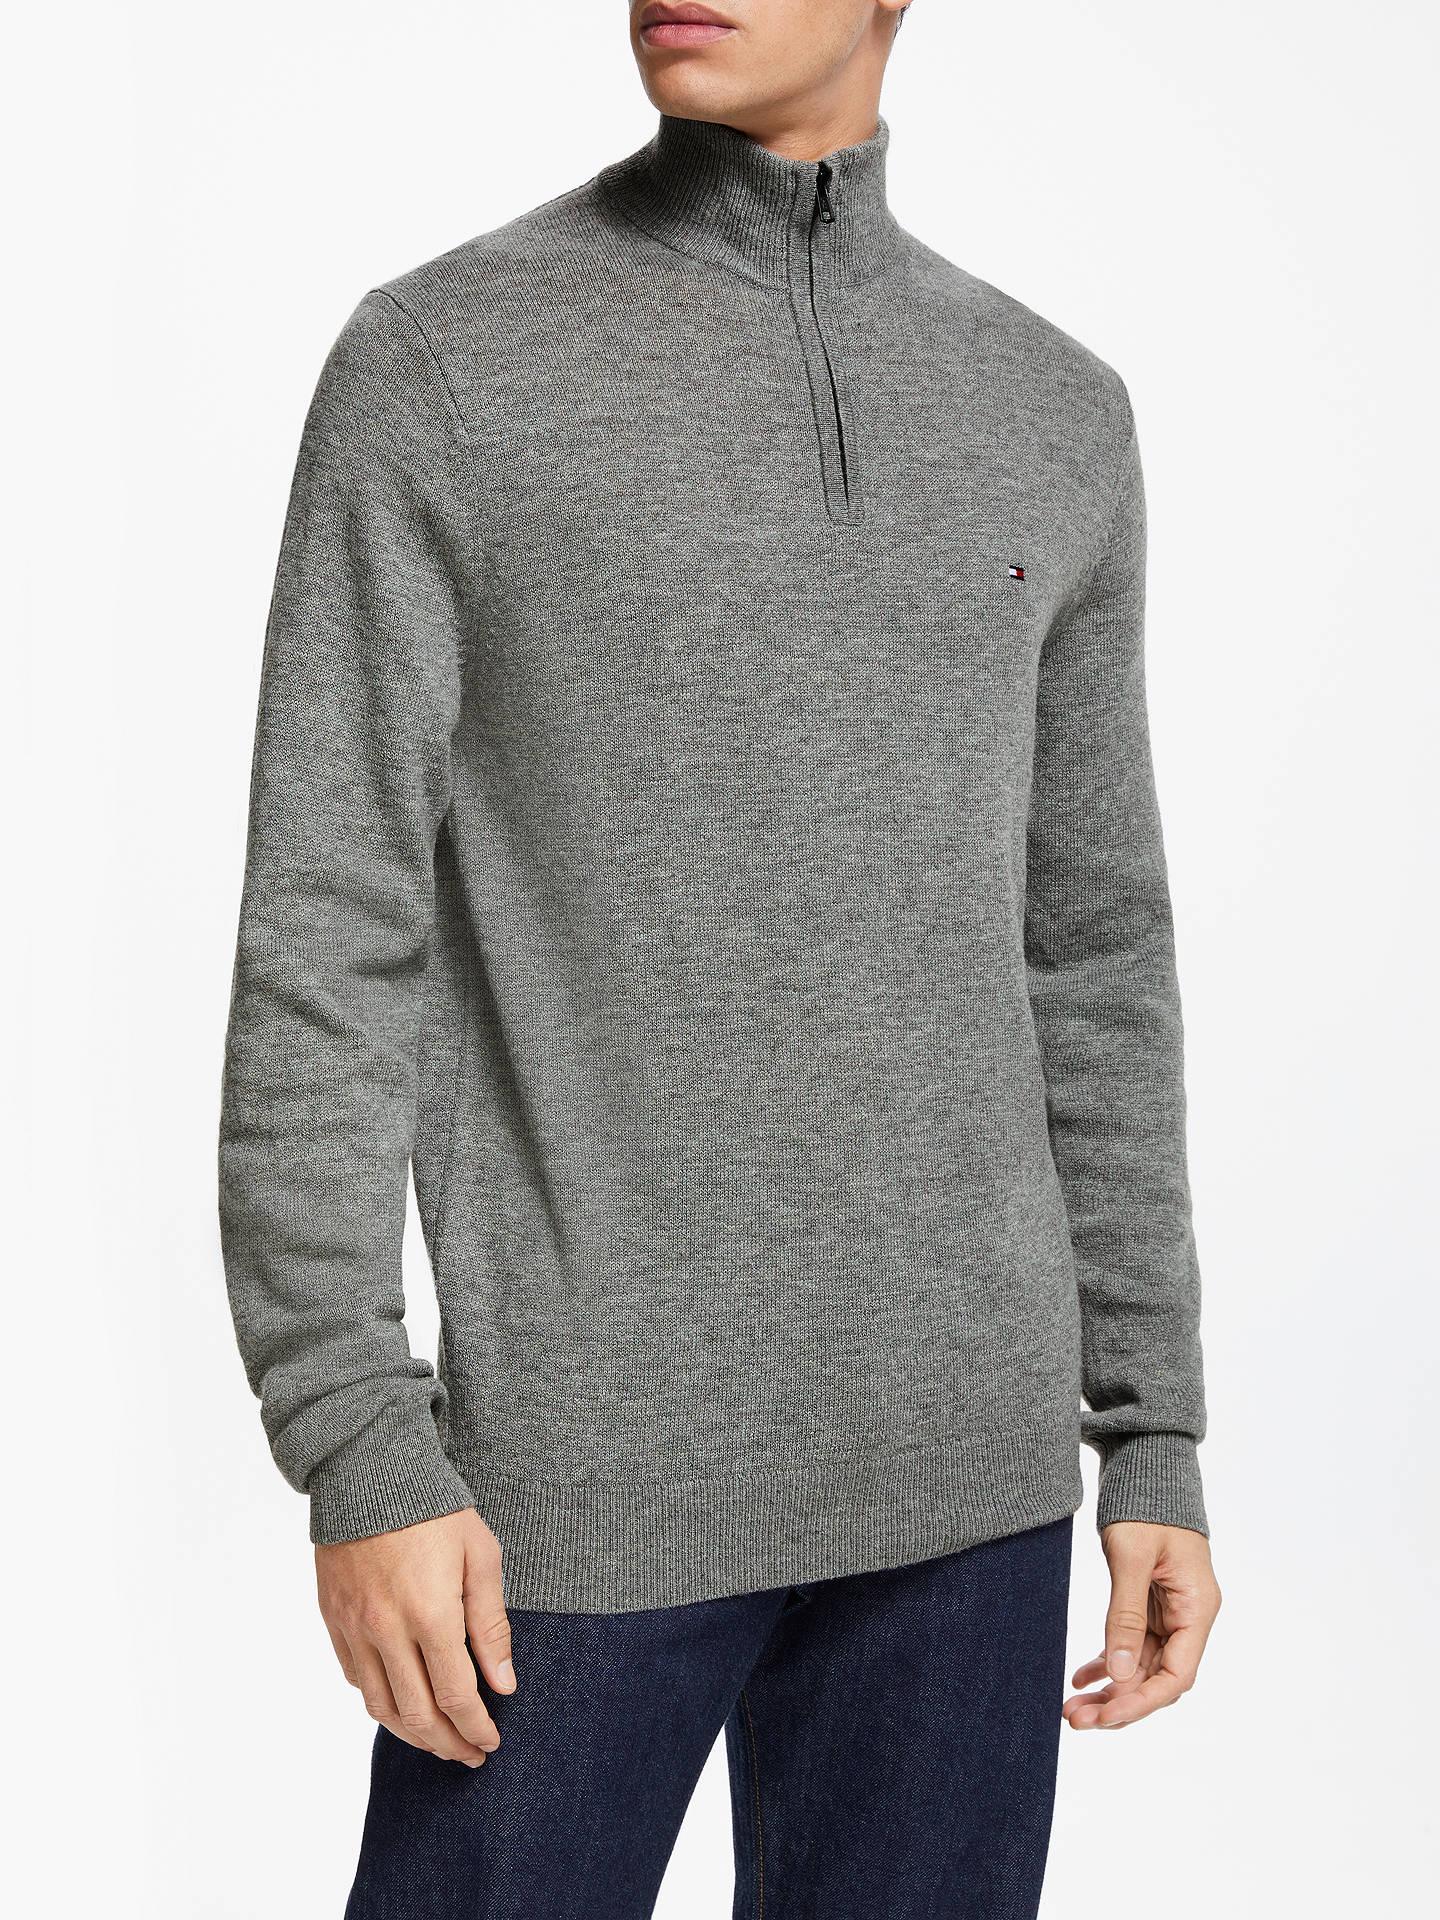 BuyTommy Hilfiger Lambswool Mock Neck Jumper, Grey, XL Online at  johnlewis.com ... 8b523033bd